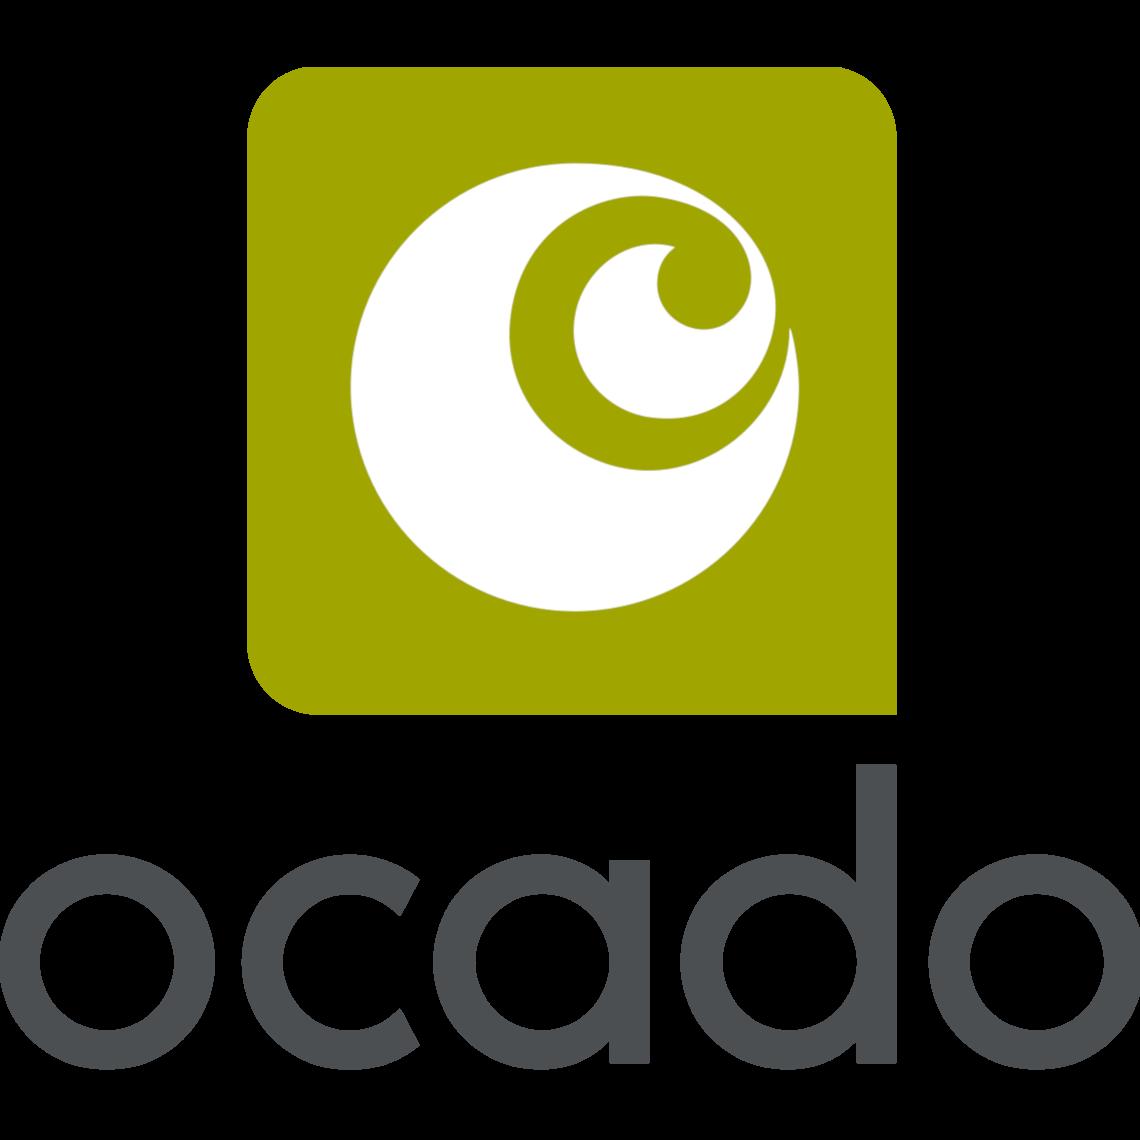 Aktie Ocado - Fundamentale Aktienanalyse